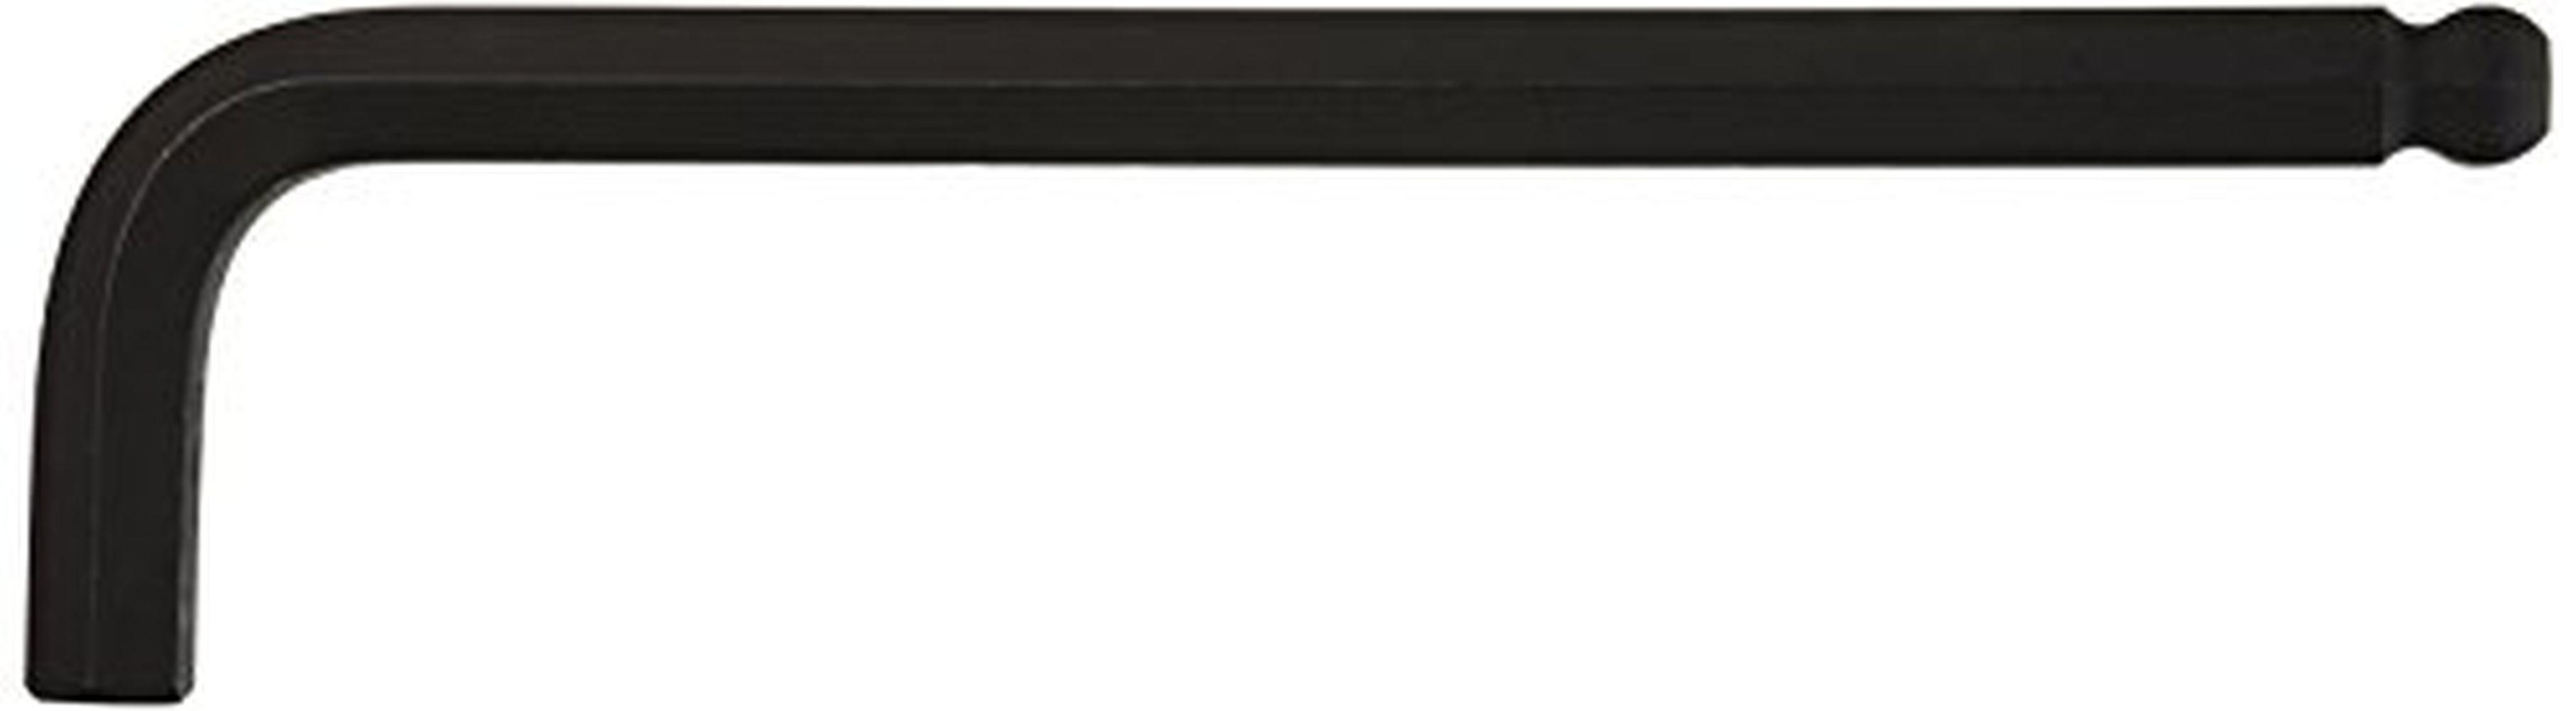 Urrea 2629SW 1113//16-Inch 121-Point Offset Striking Wrench